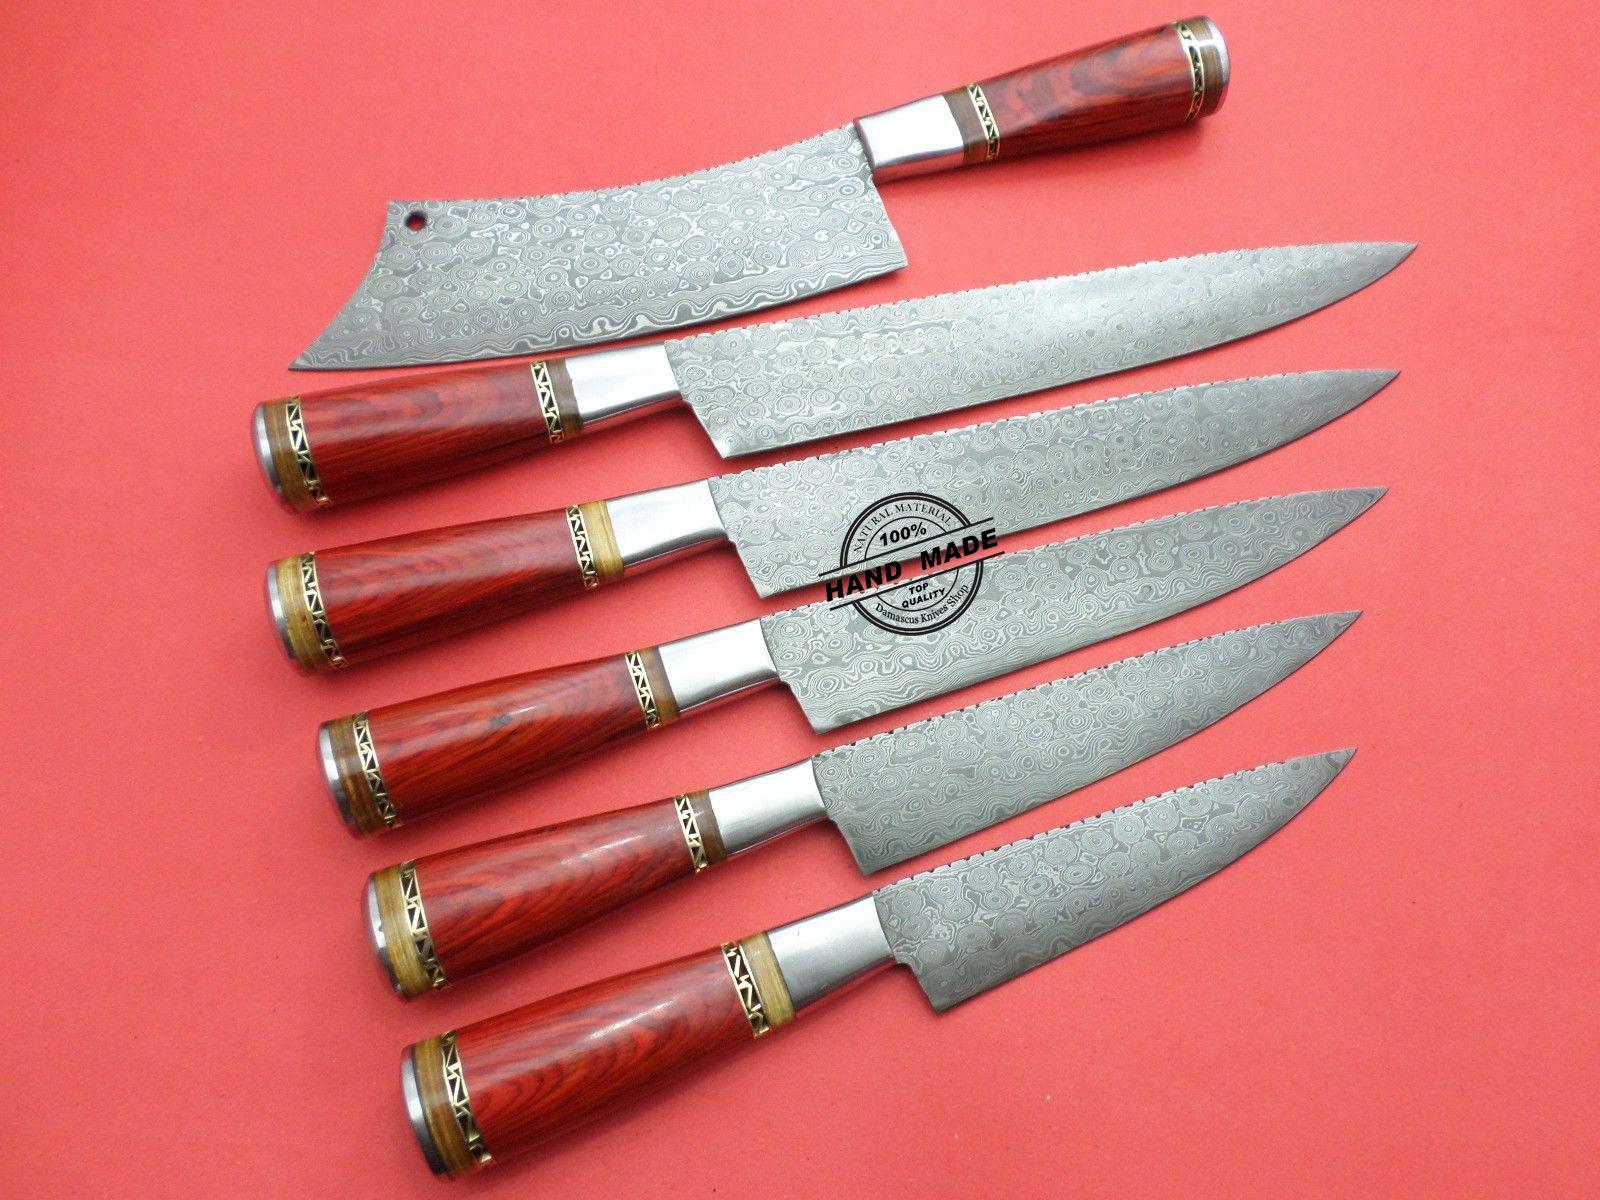 lot pcs damascus kitchen chef knives custom handmade knife kitchen knife custom handmade damascus steel kitchen chef knife